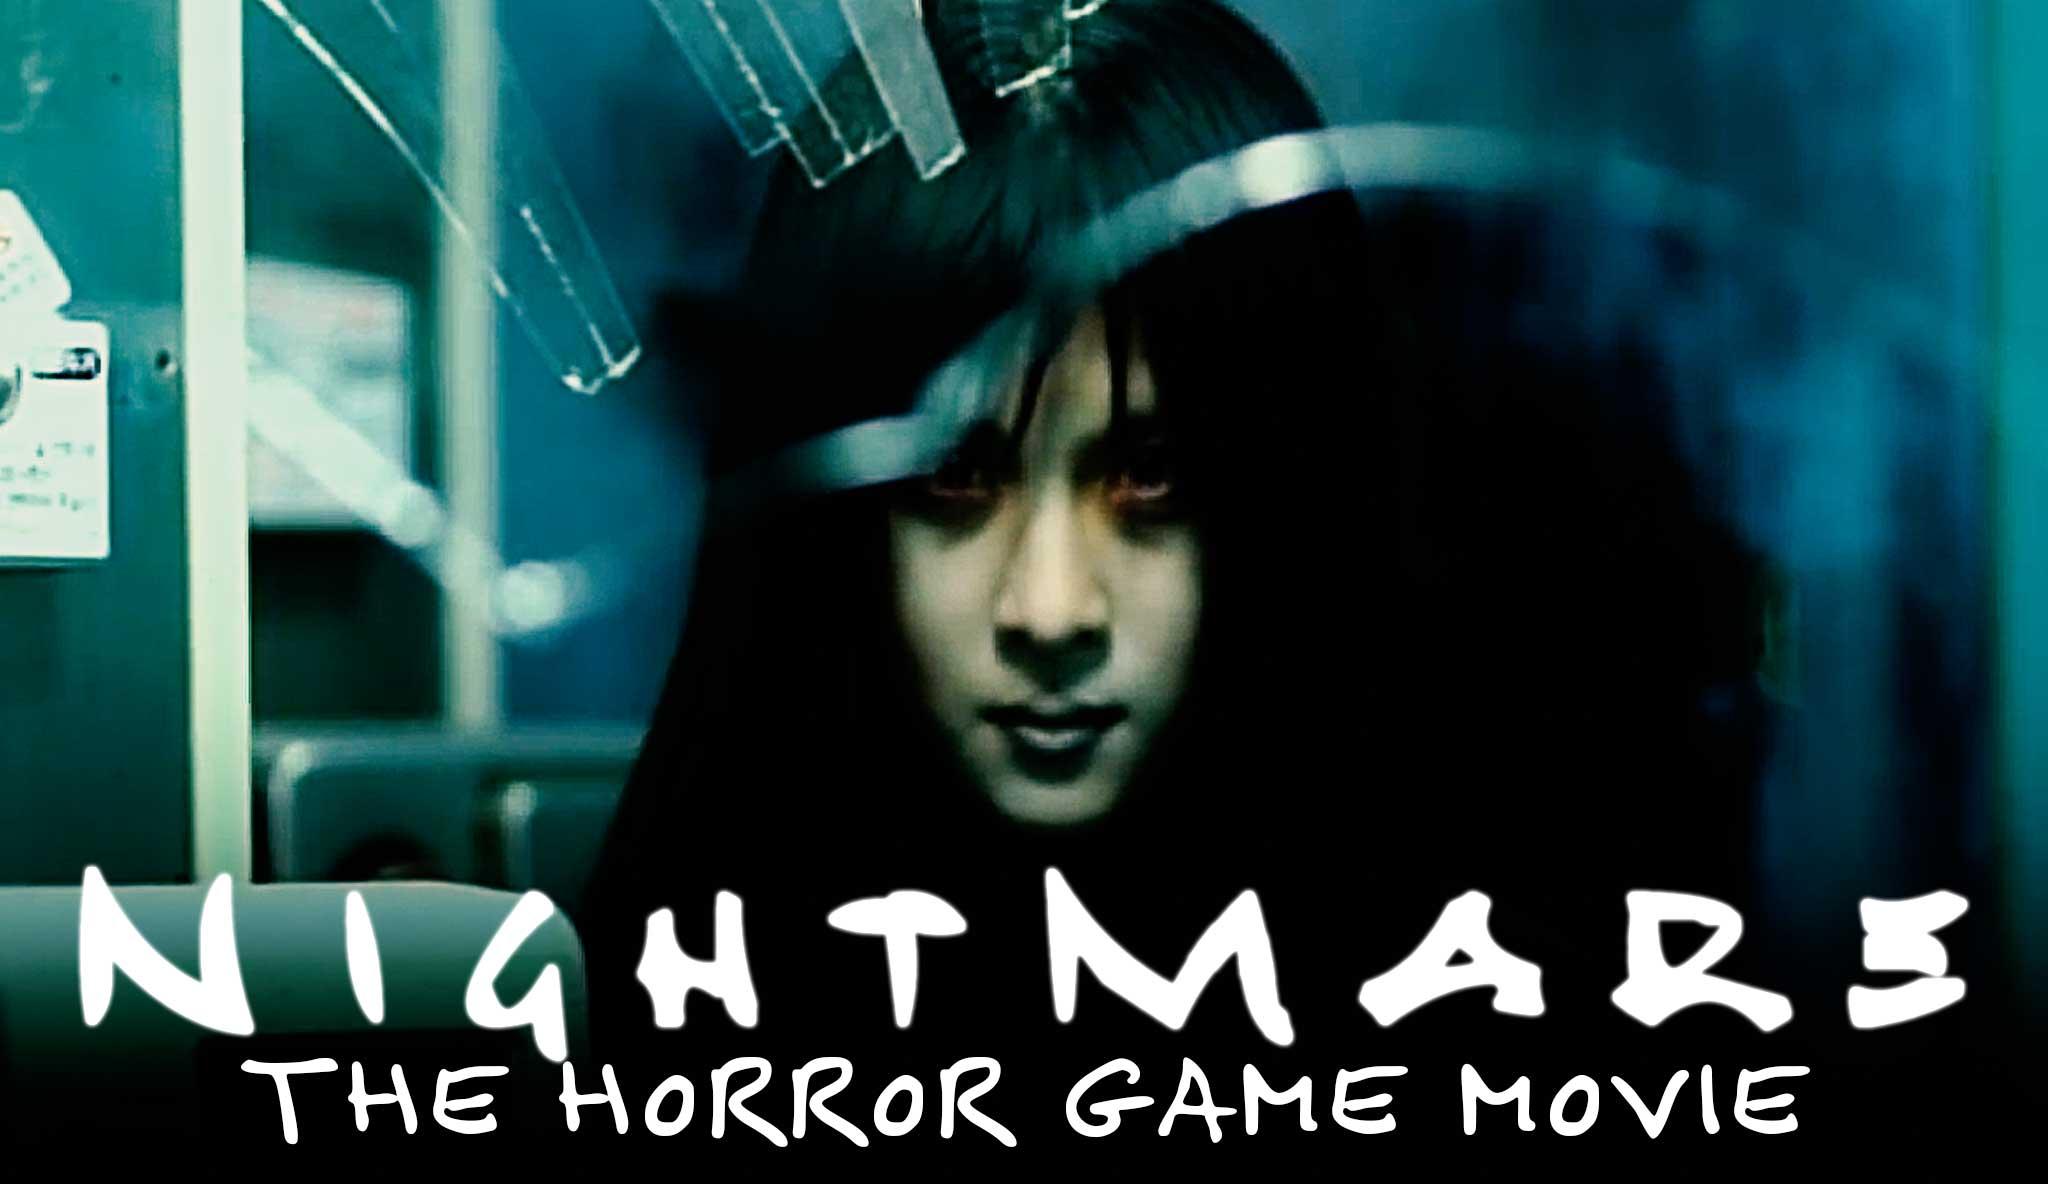 nightmare-the-horror-game-movie\header.jpg